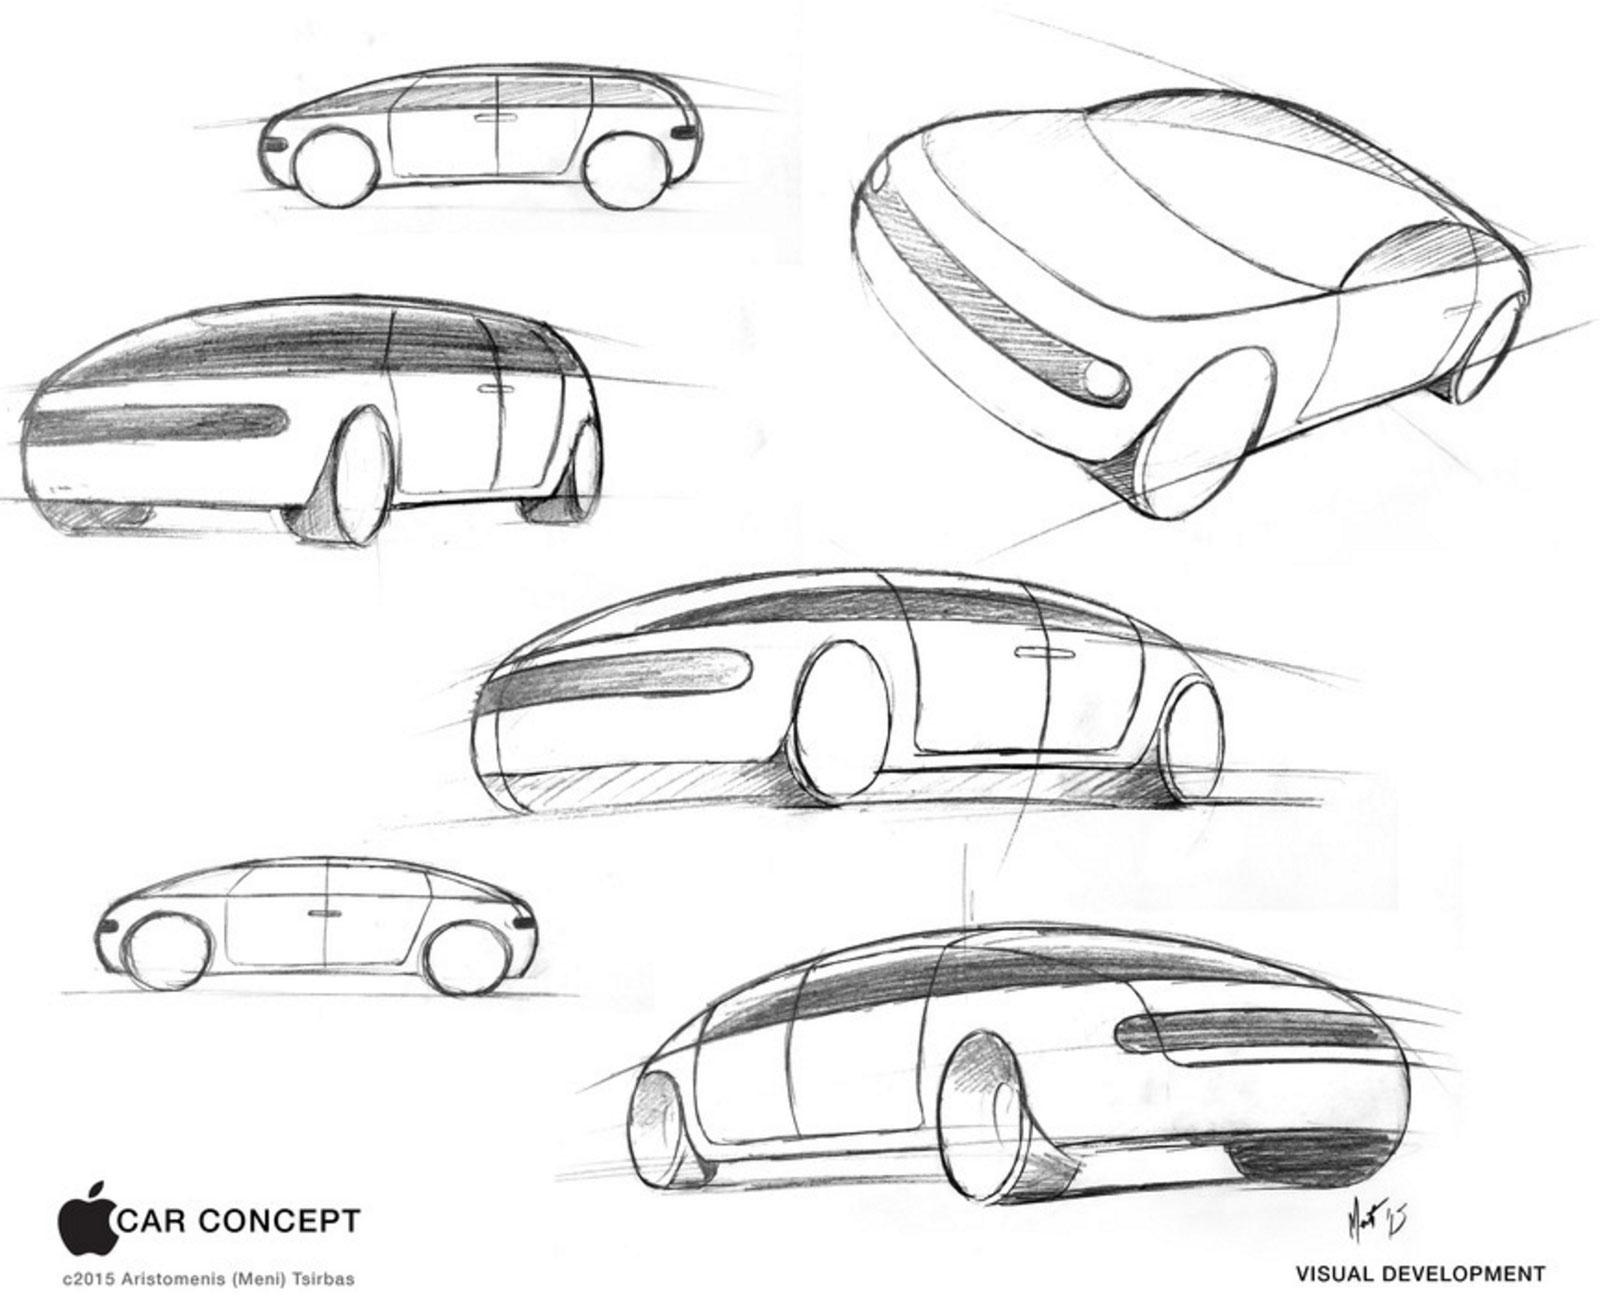 Concepto de diseño de coche de Apple de Aristomenis (Meni) Tsirbas